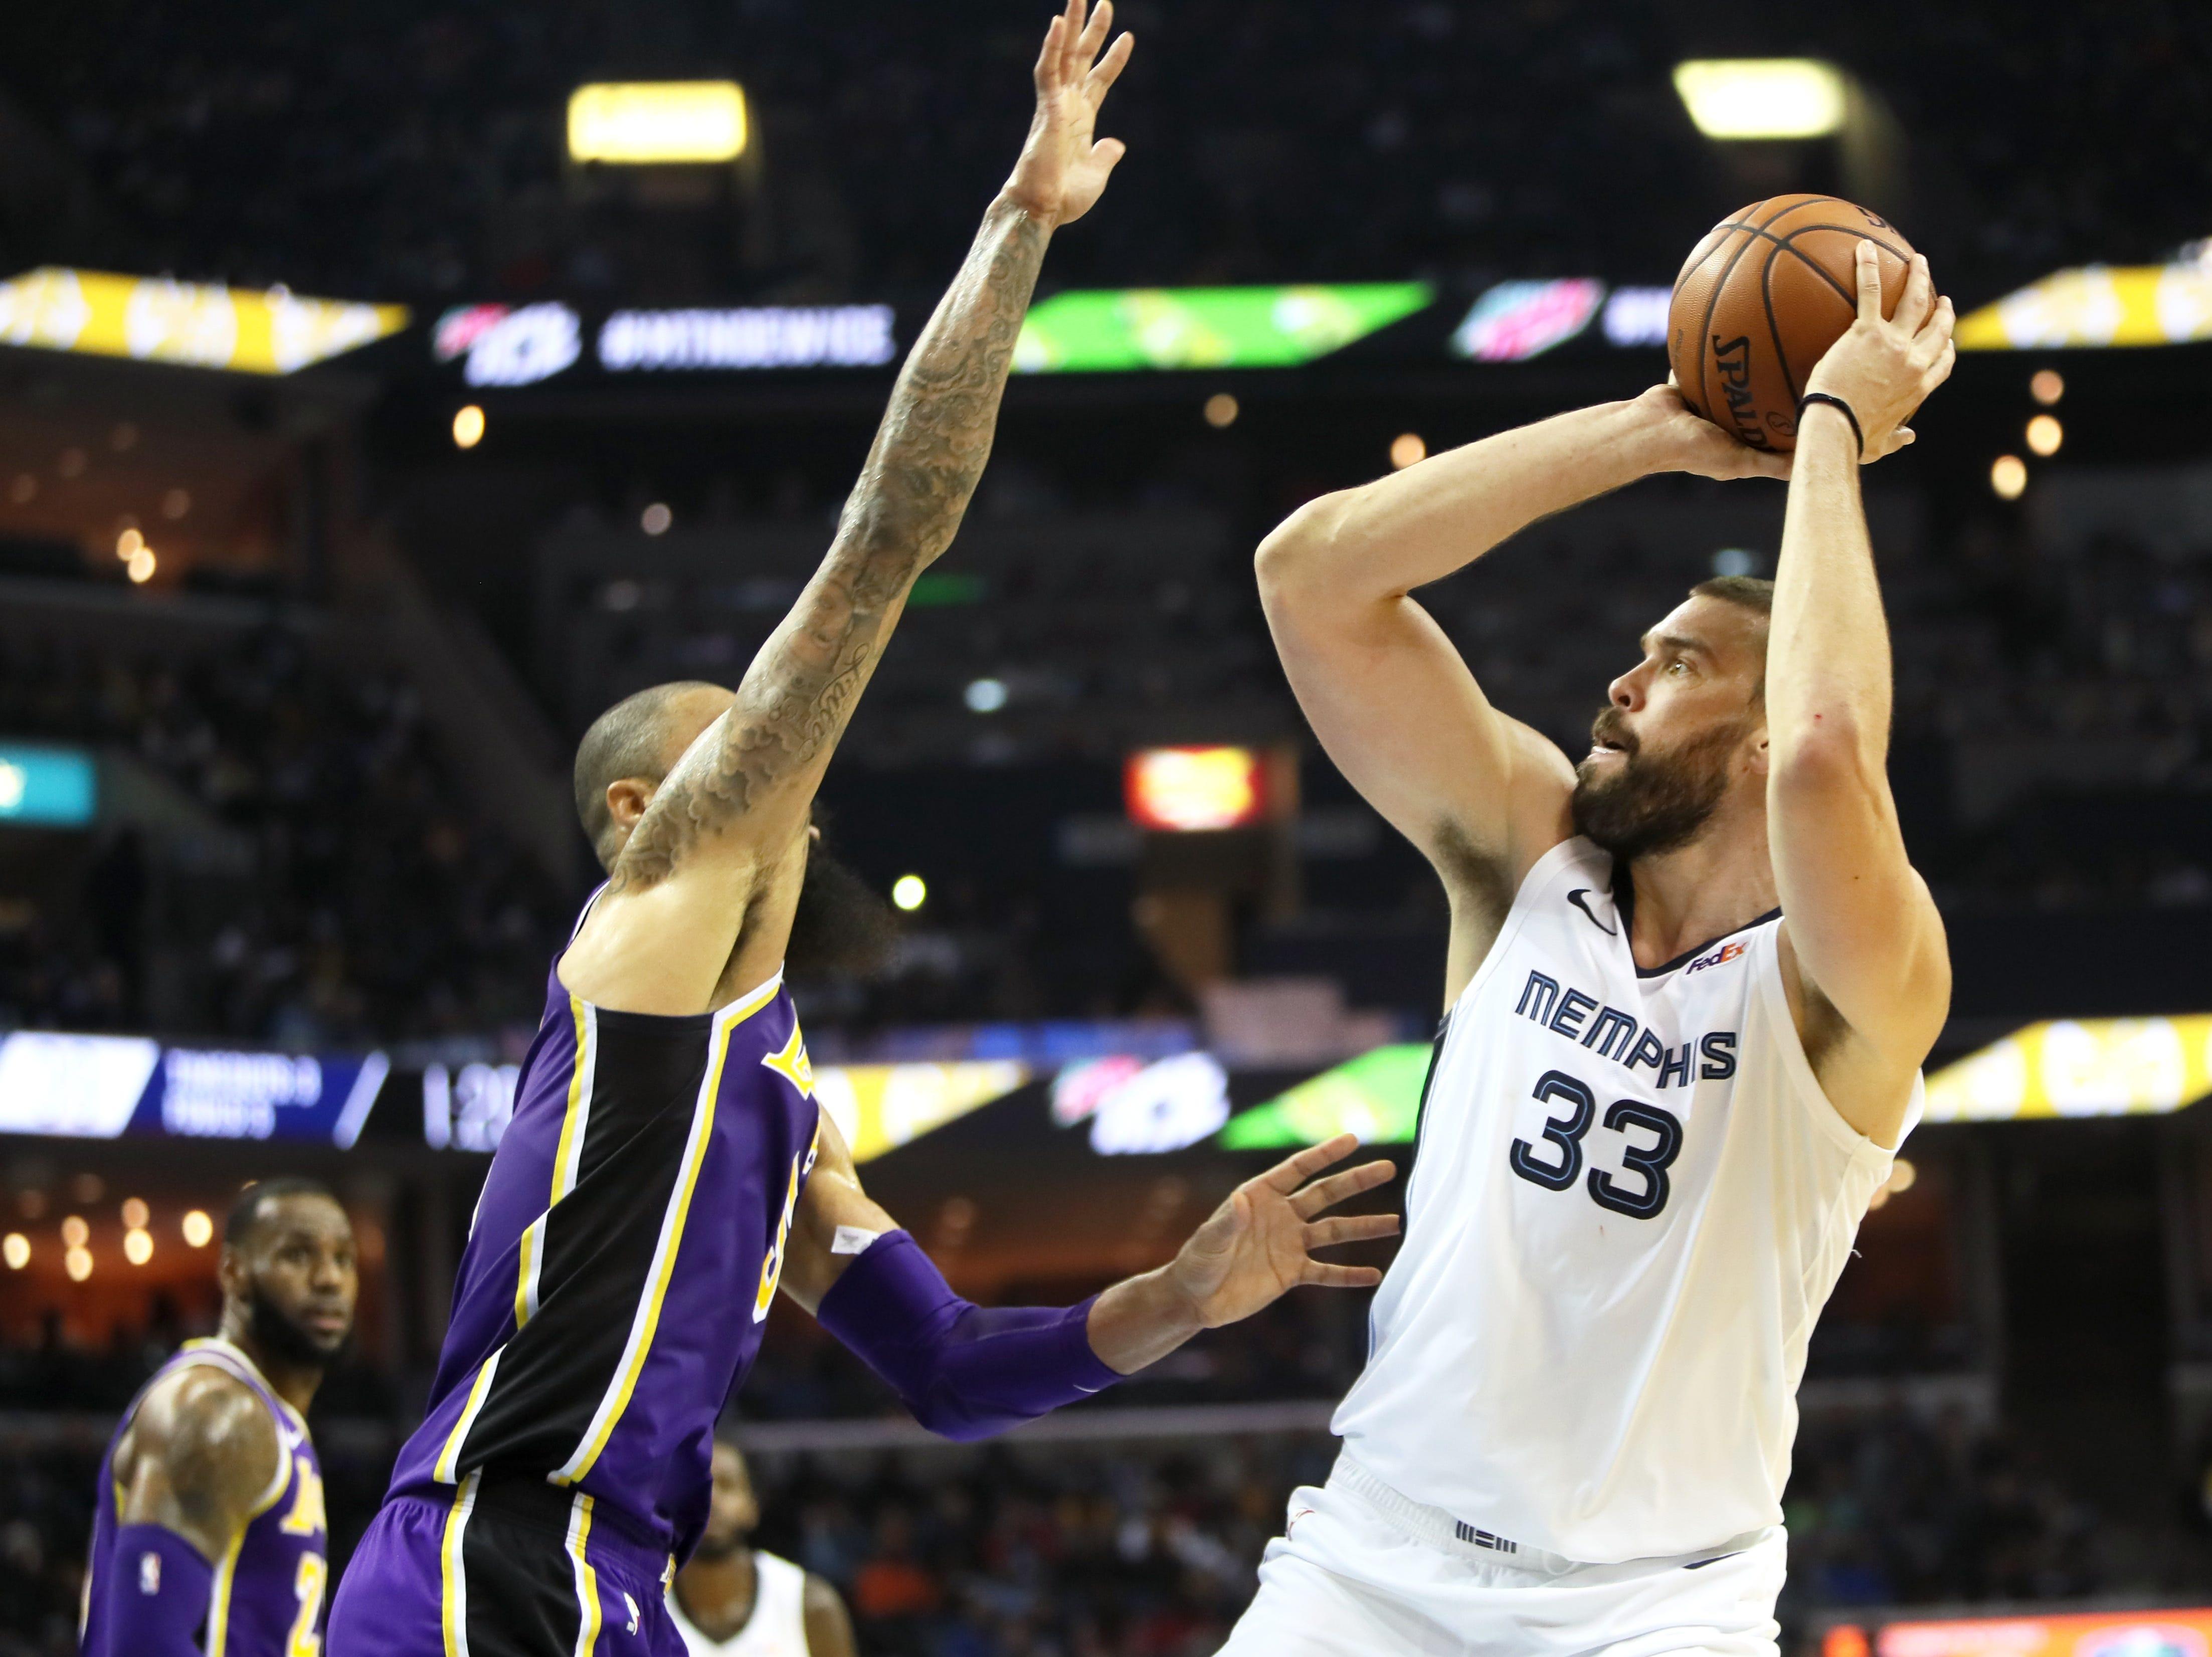 Memphis Grizzlies center Marc Gasol shoots the ball against Los Angeles Lakers defender Tyson Chandler at the FedExForum on Saturday, Dec. 6, 2018.